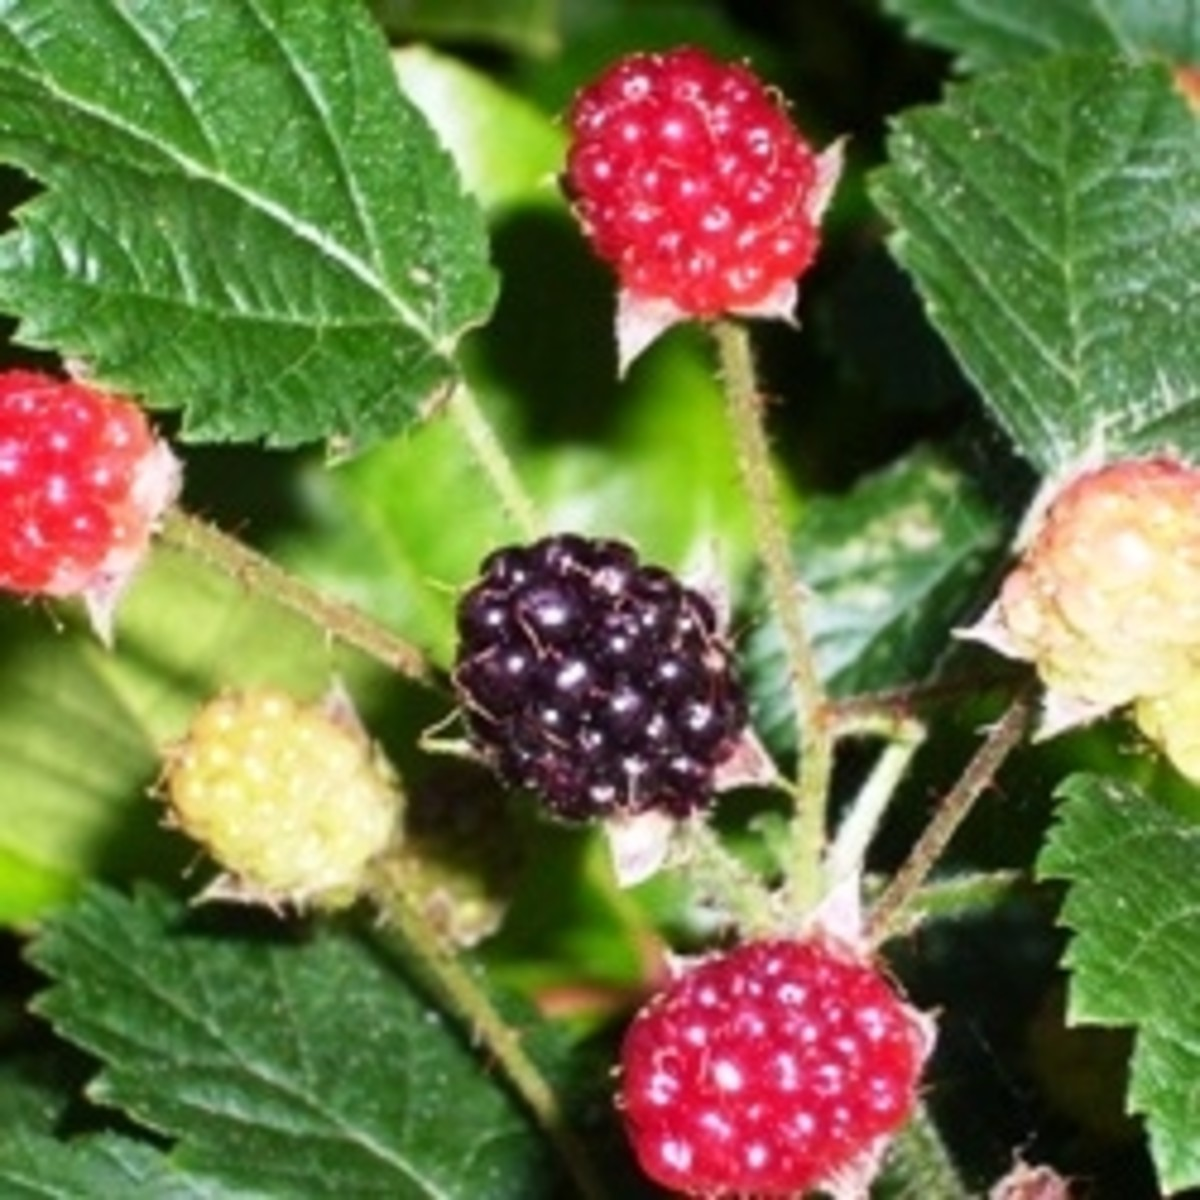 edible-wild-berries